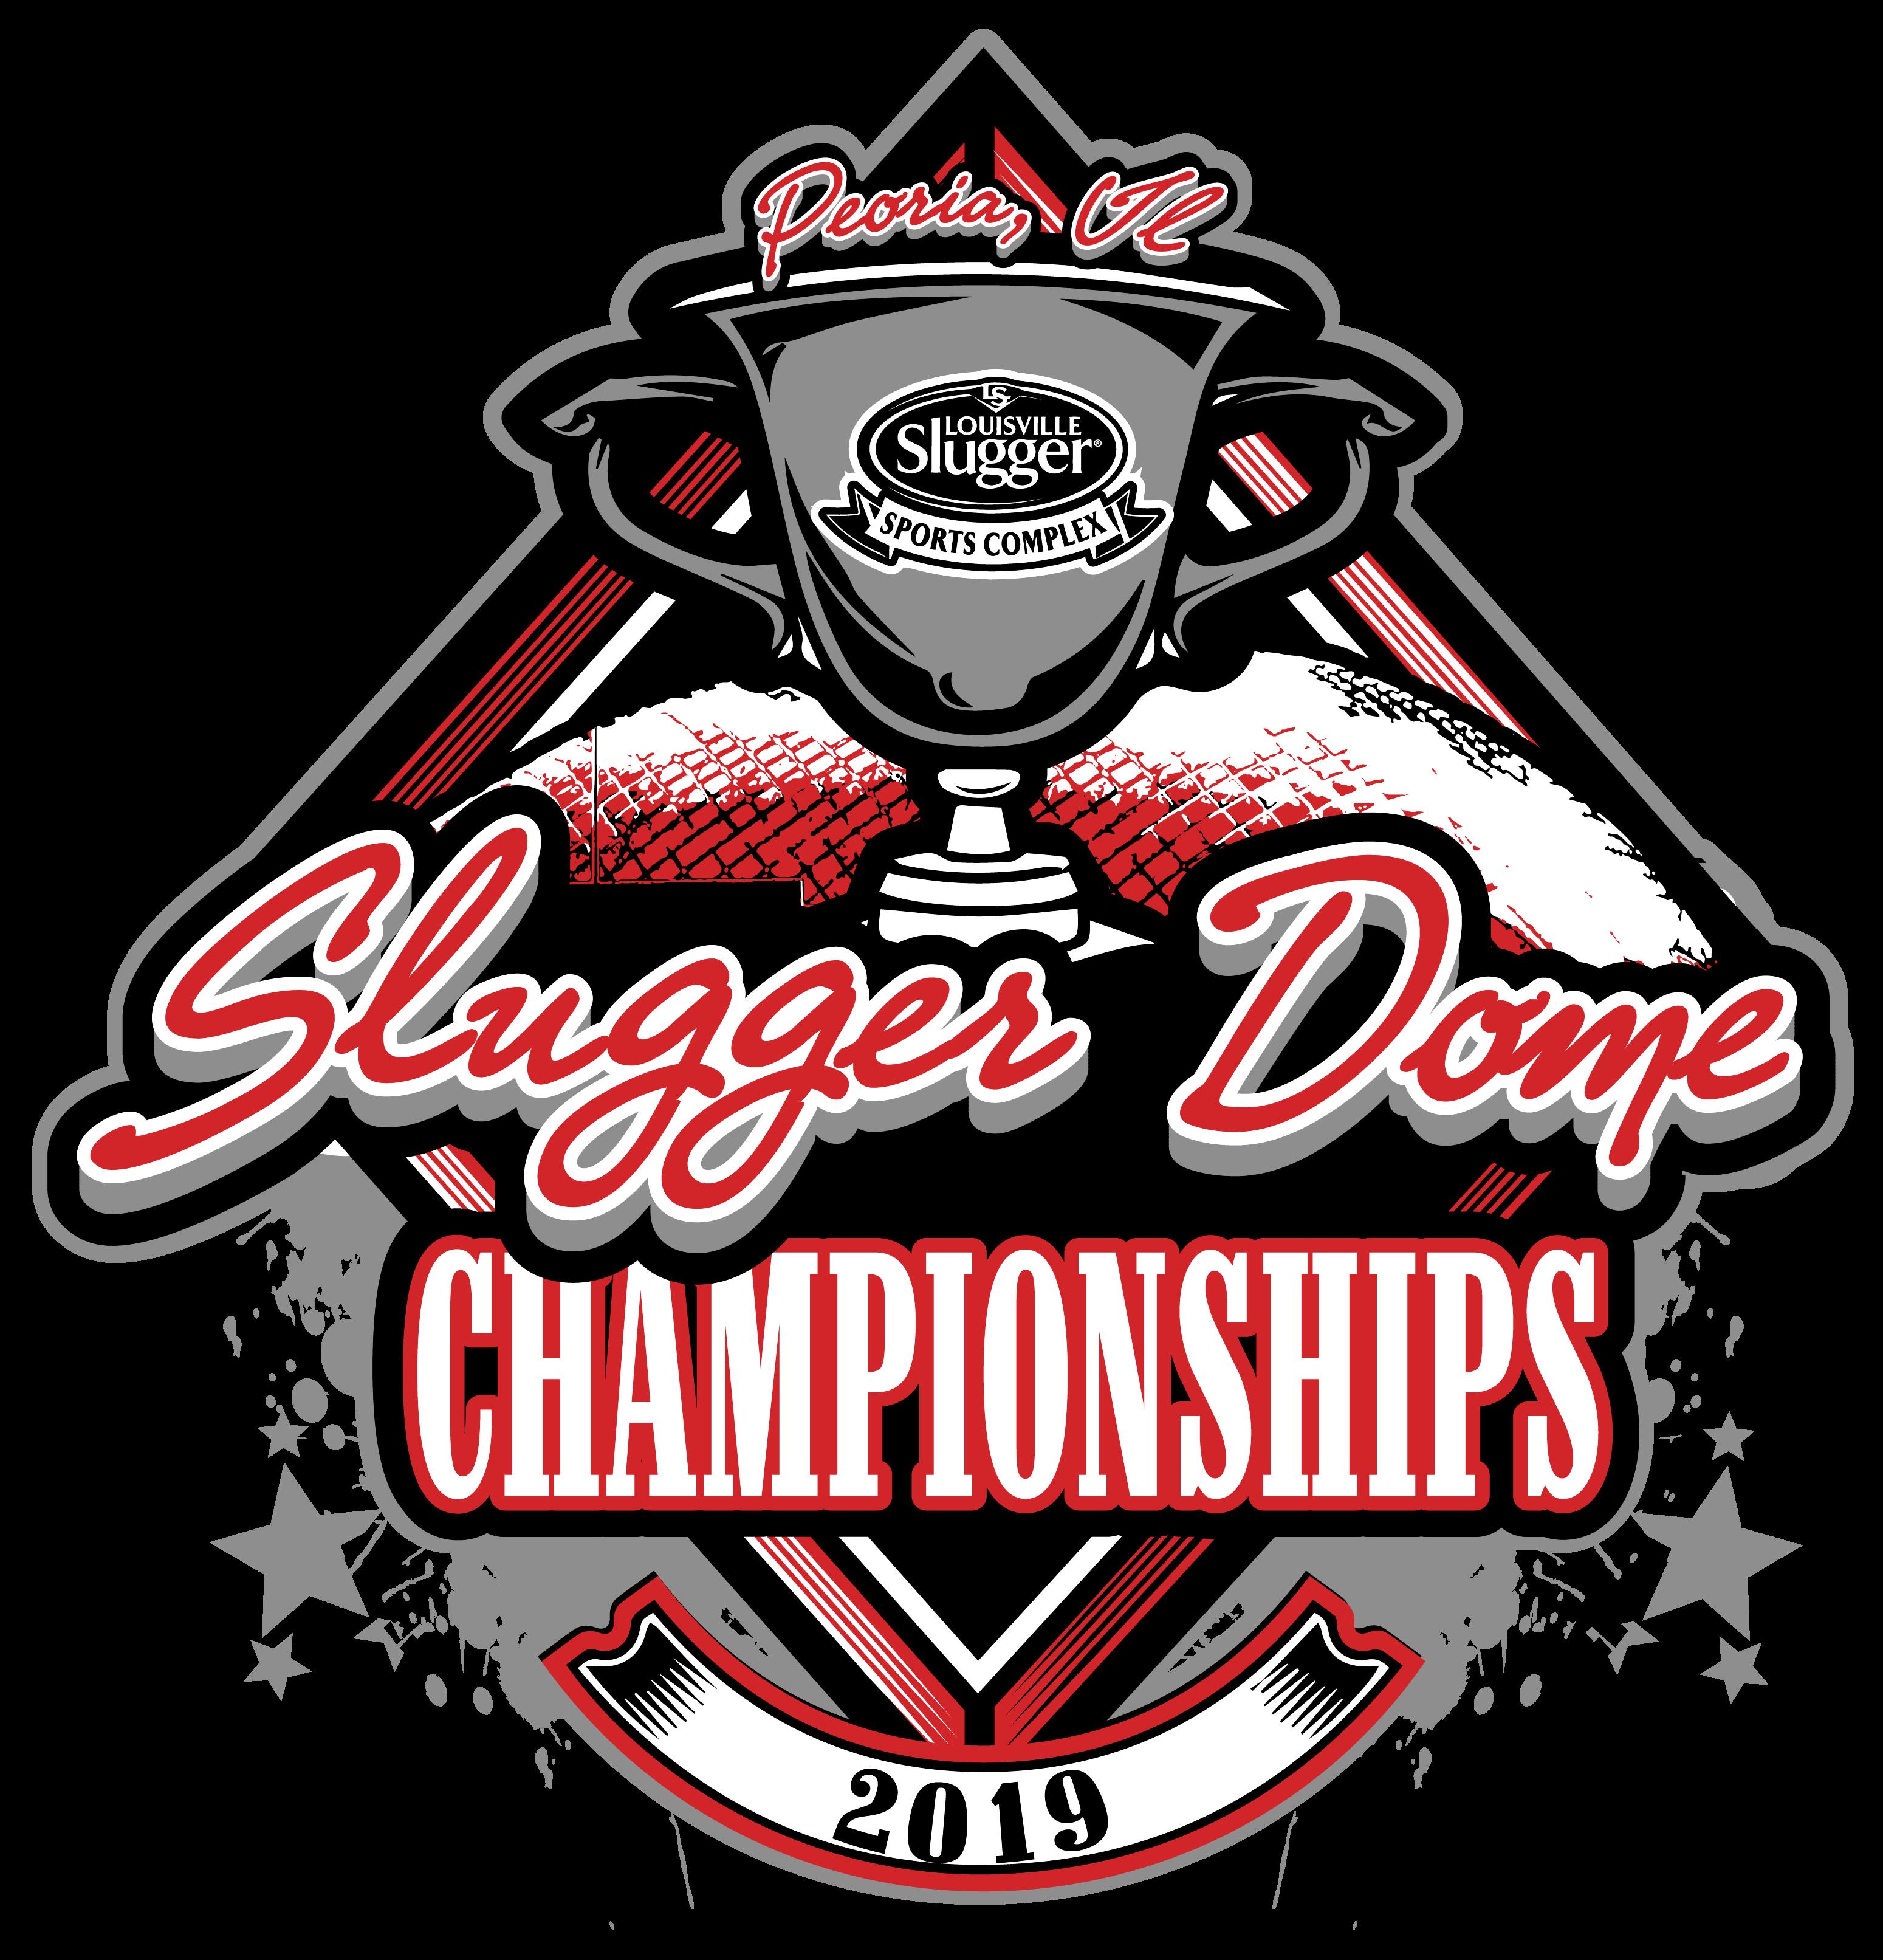 Slugger Dome Championships